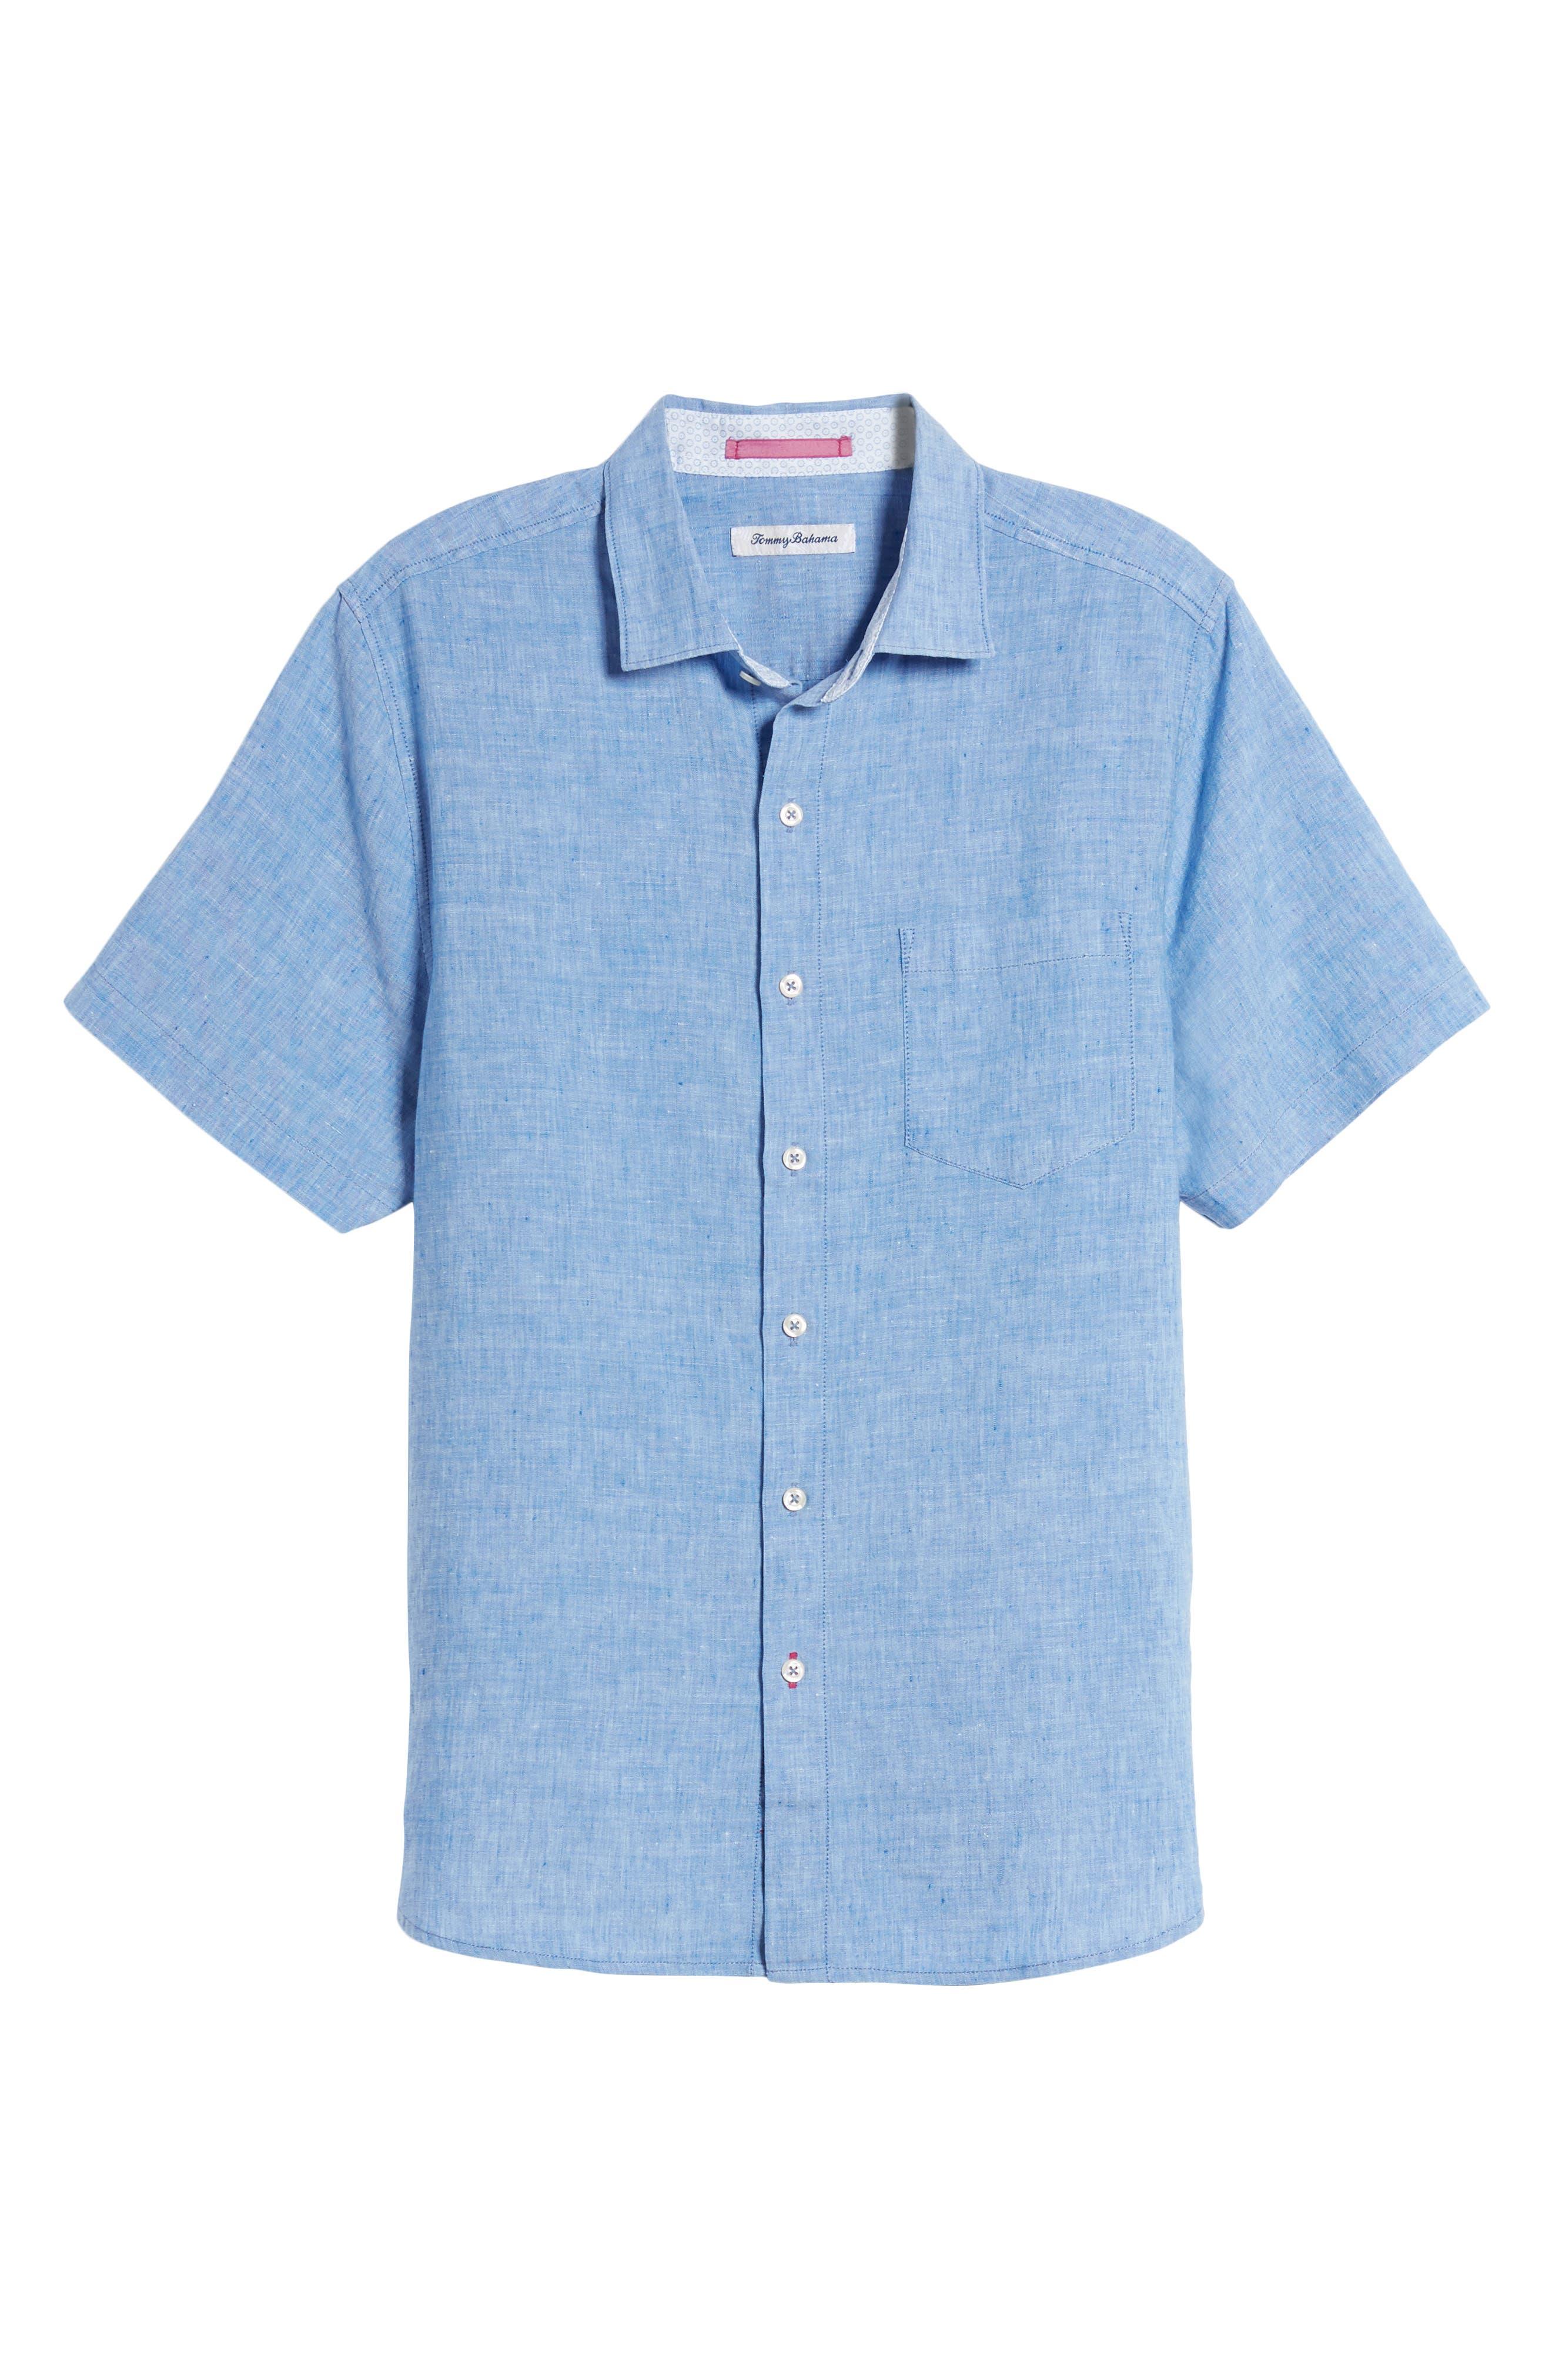 Lanai Tides Linen Blend Sport Shirt,                             Alternate thumbnail 6, color,                             Cobalt Sea